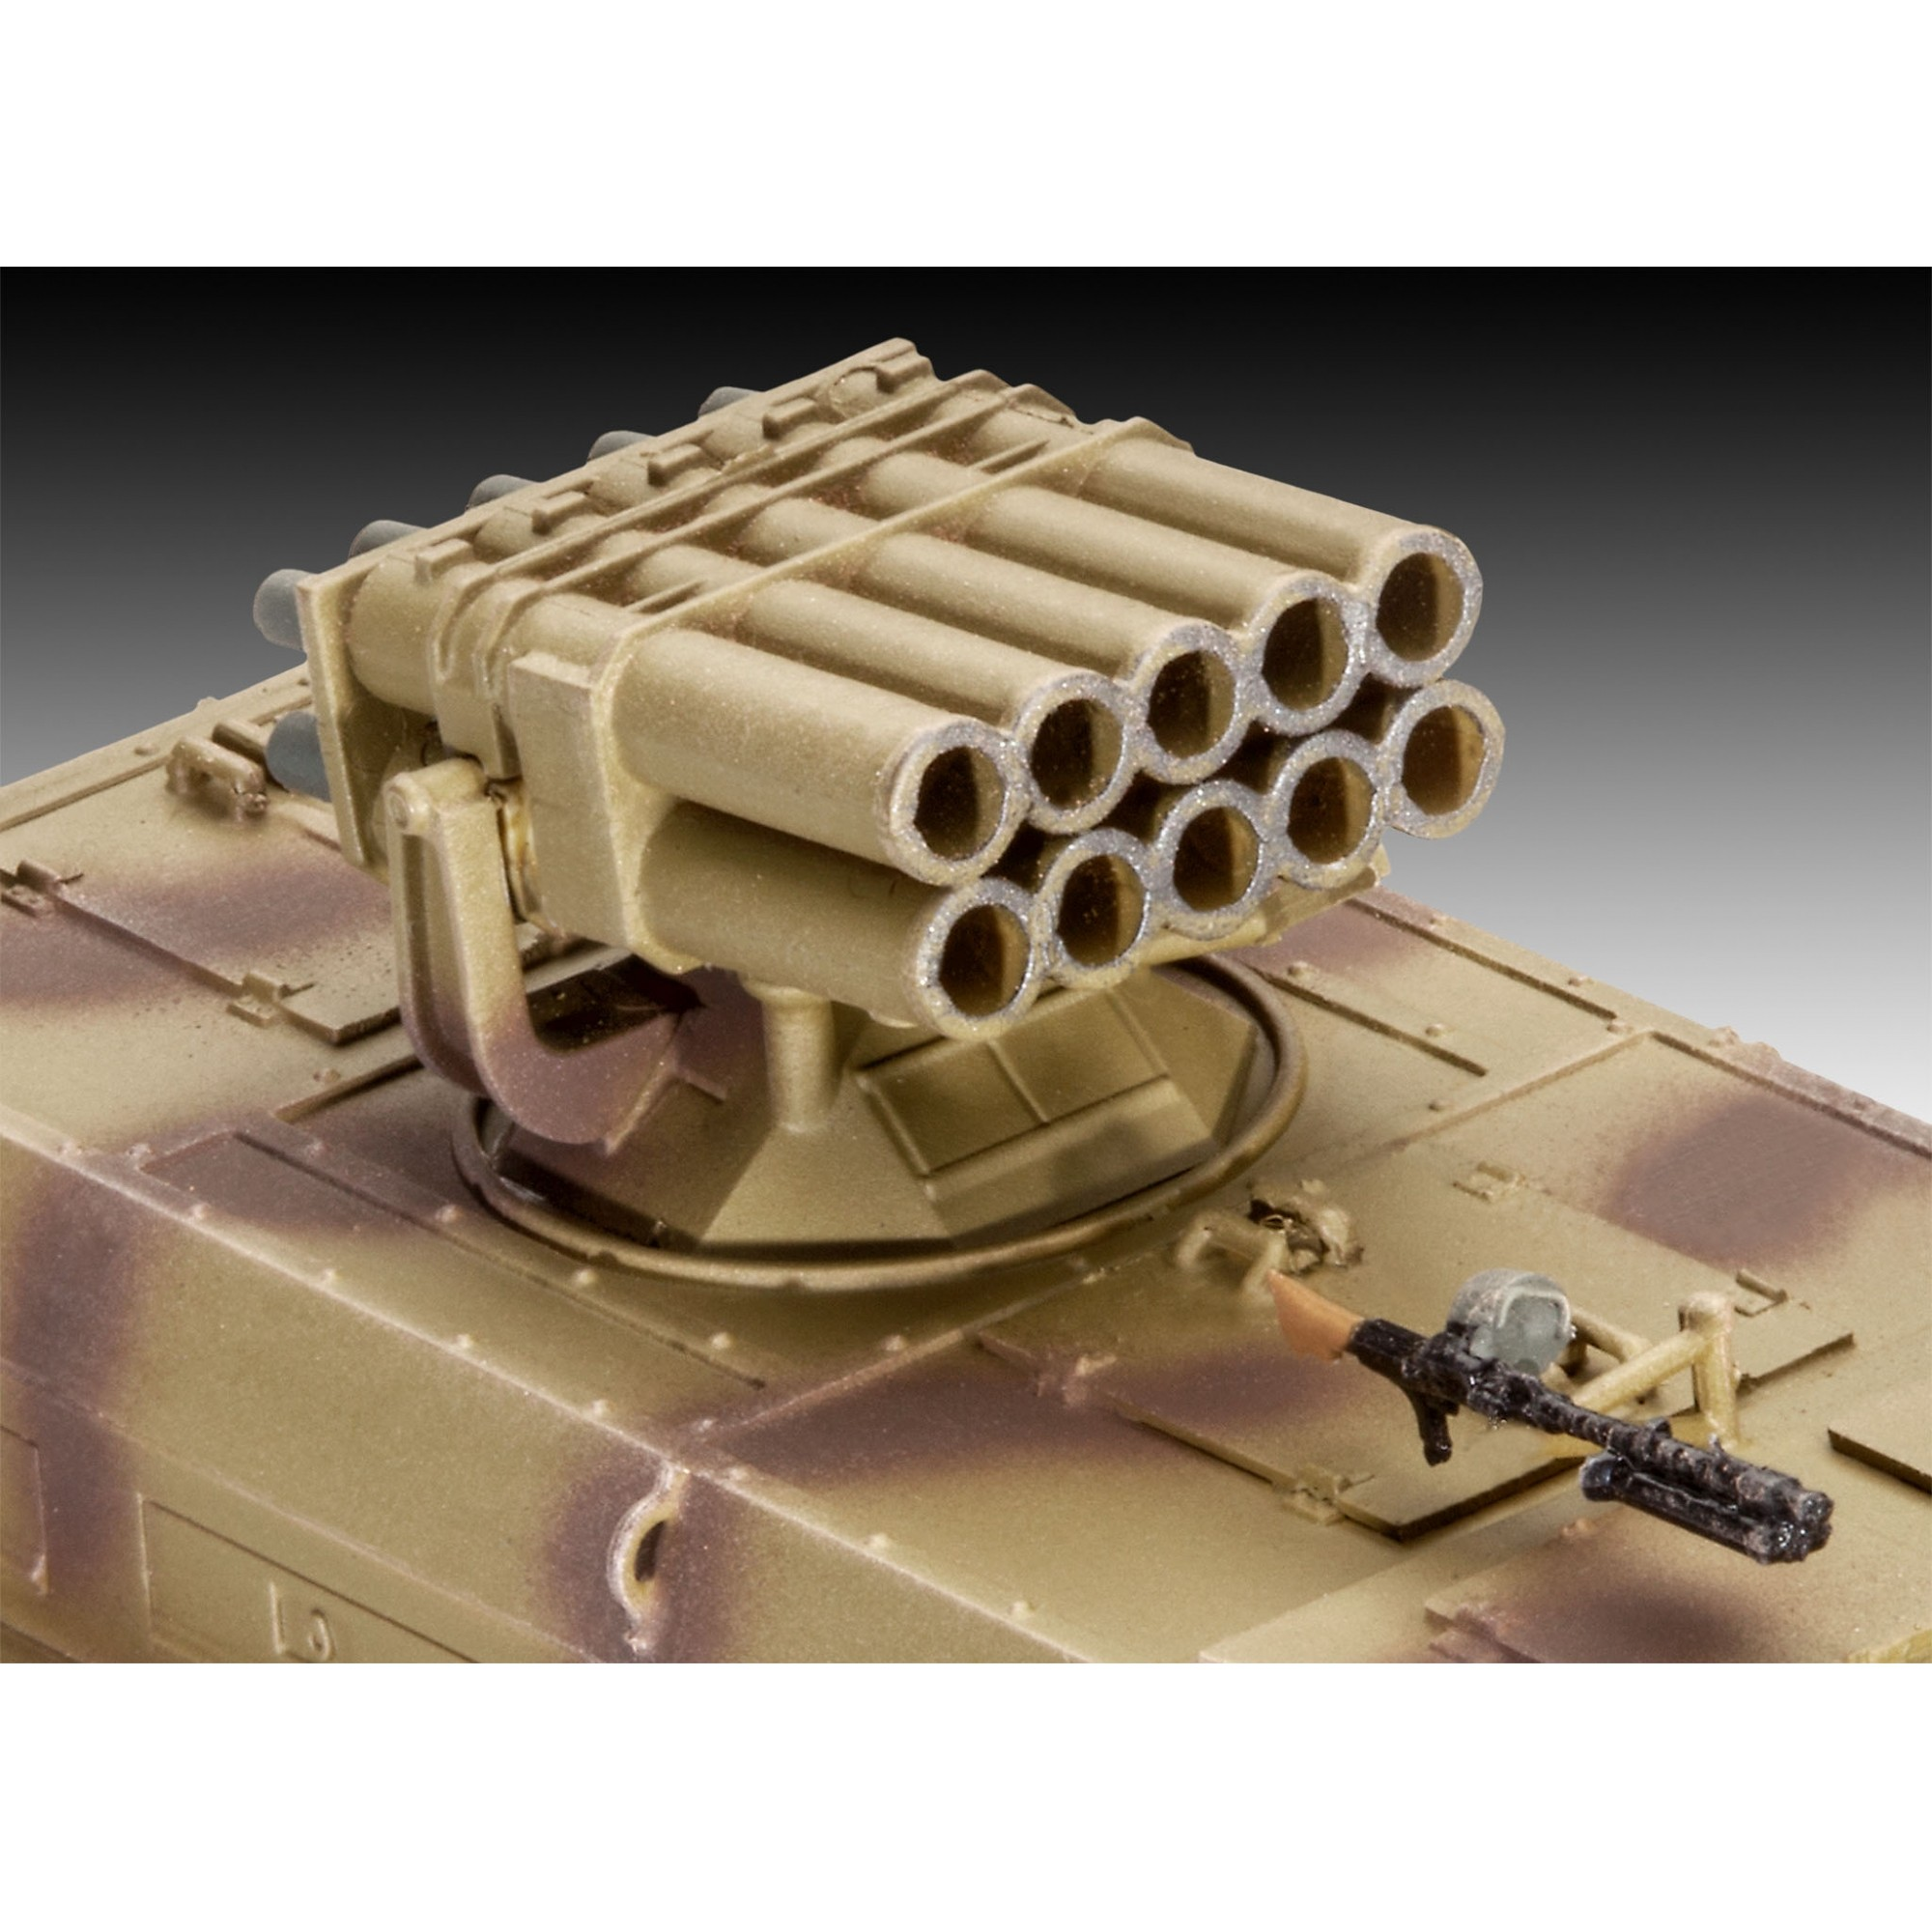 SWS with 15 cm Panzerwerfer 42 - 1/72 - Revell 03264  - BLIMPS COMÉRCIO ELETRÔNICO